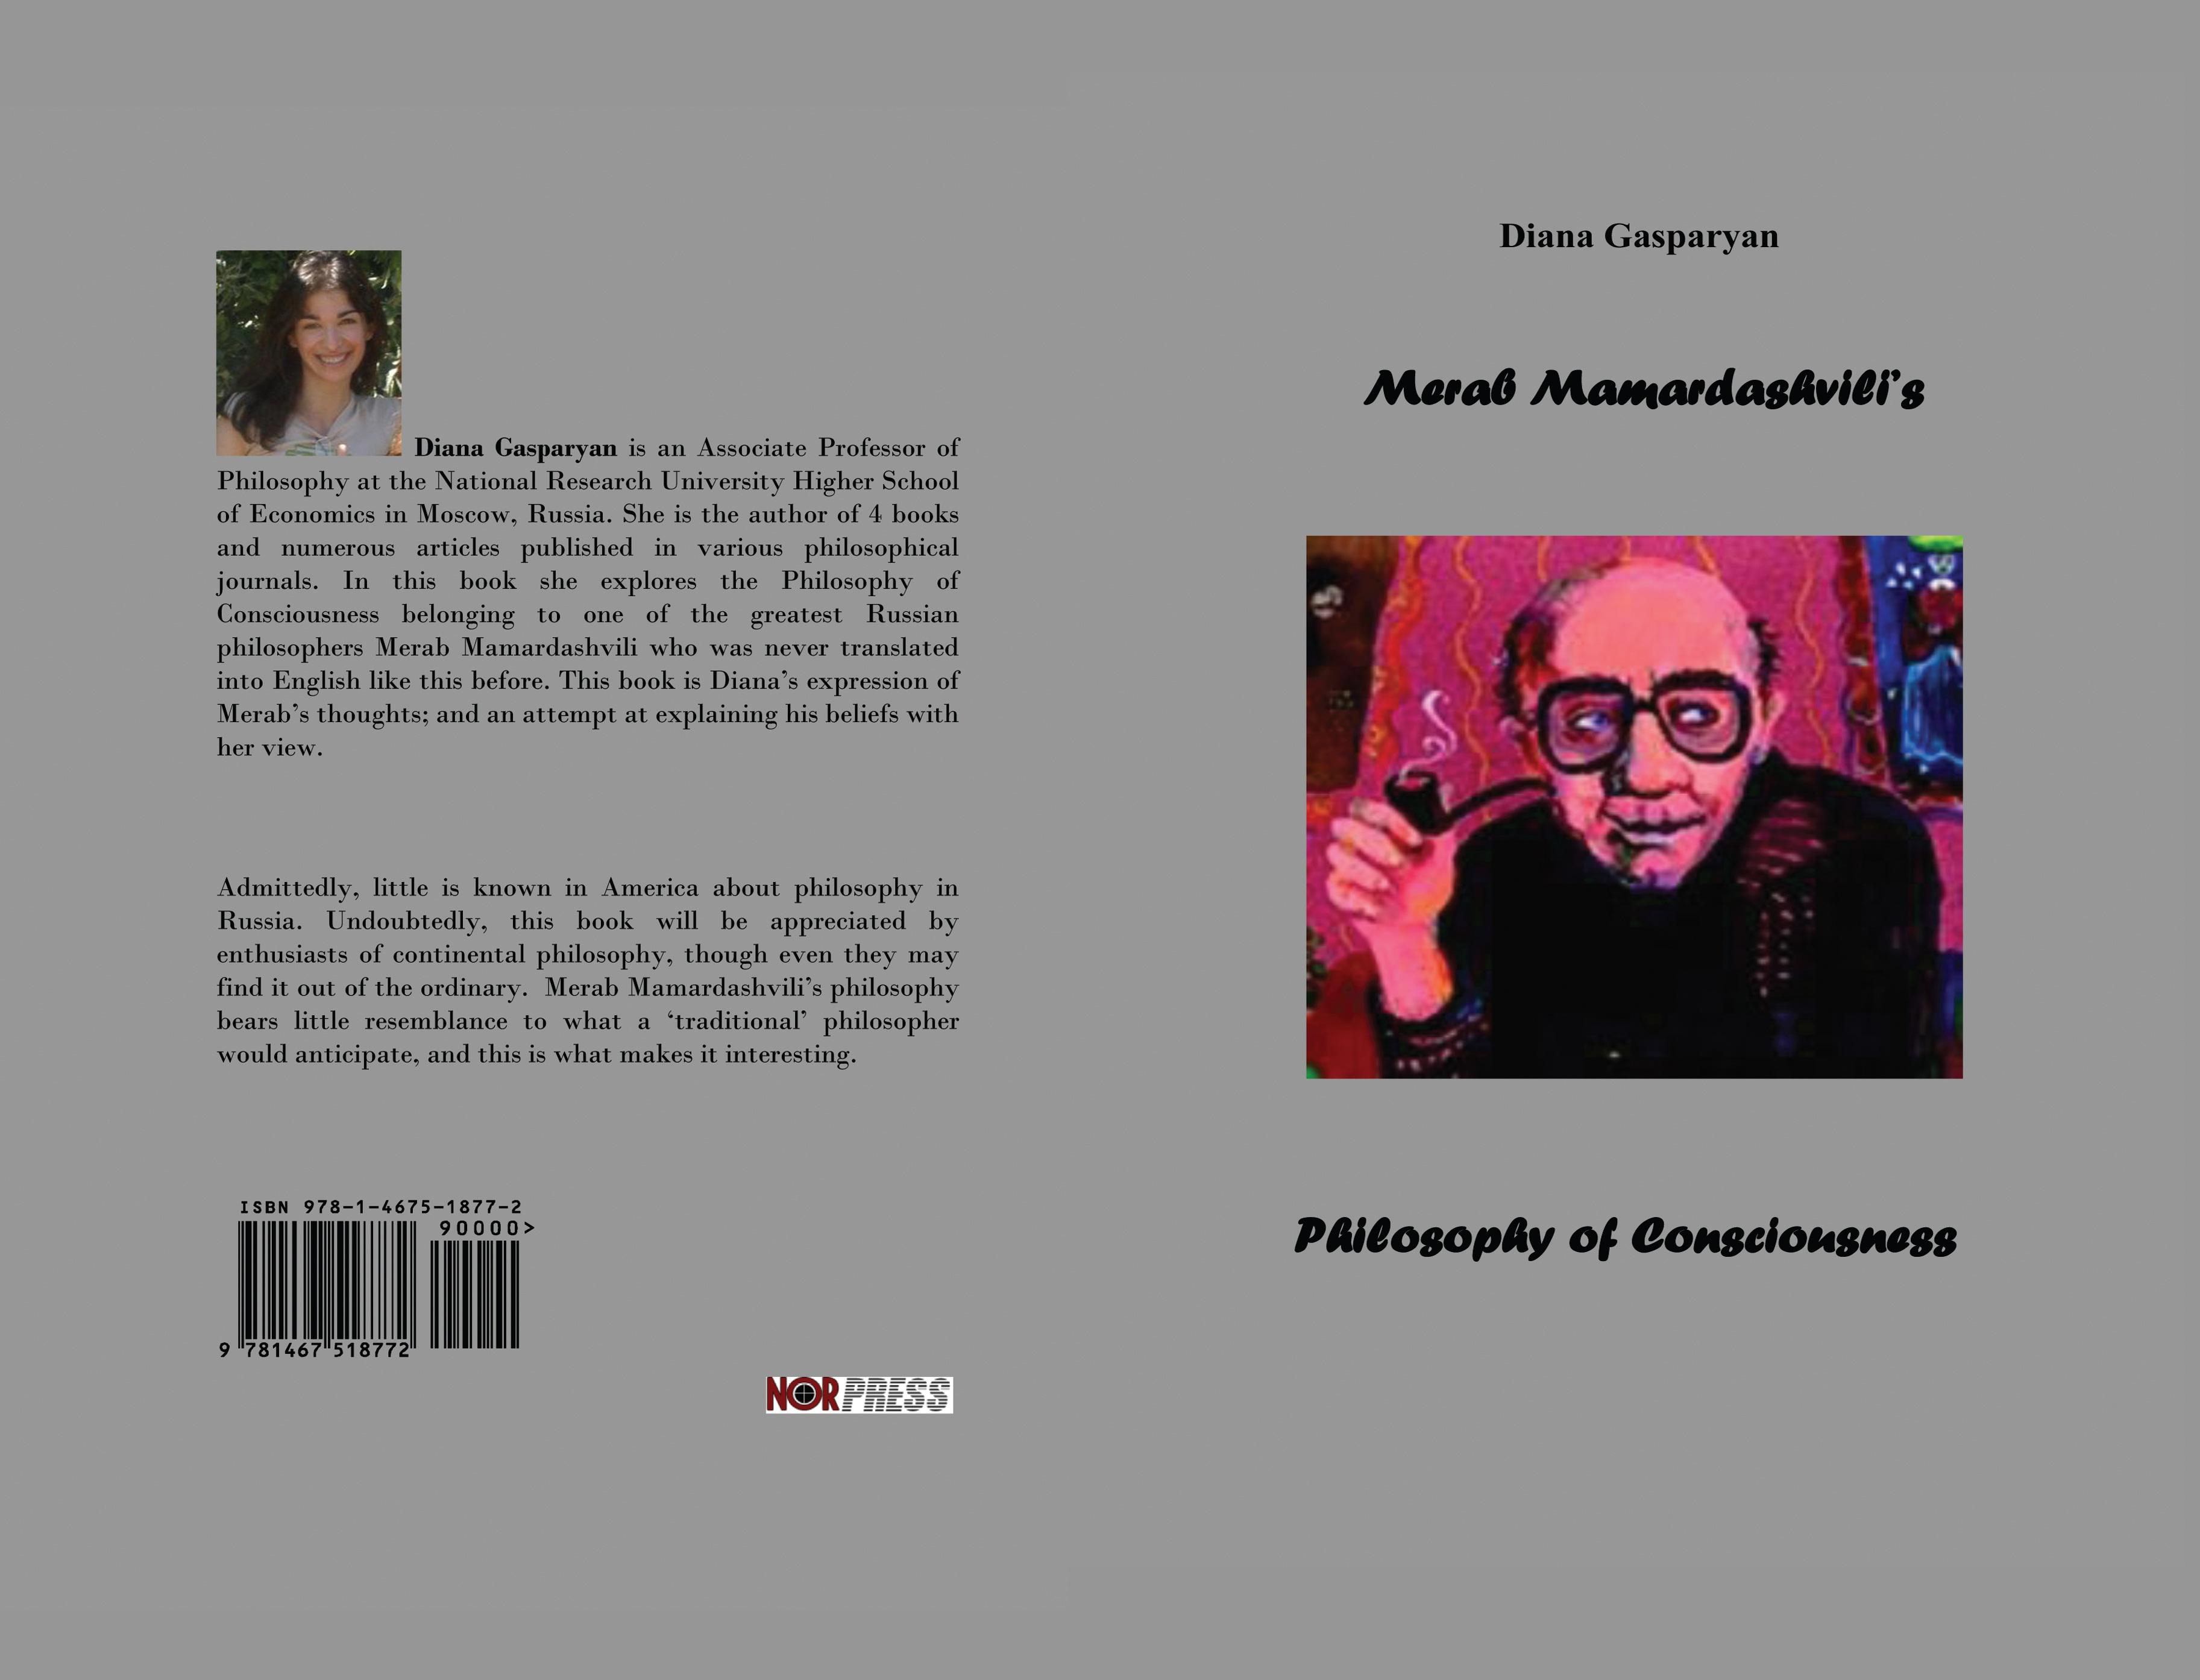 Merab Mamardashvili's Philosophy of Consciousness